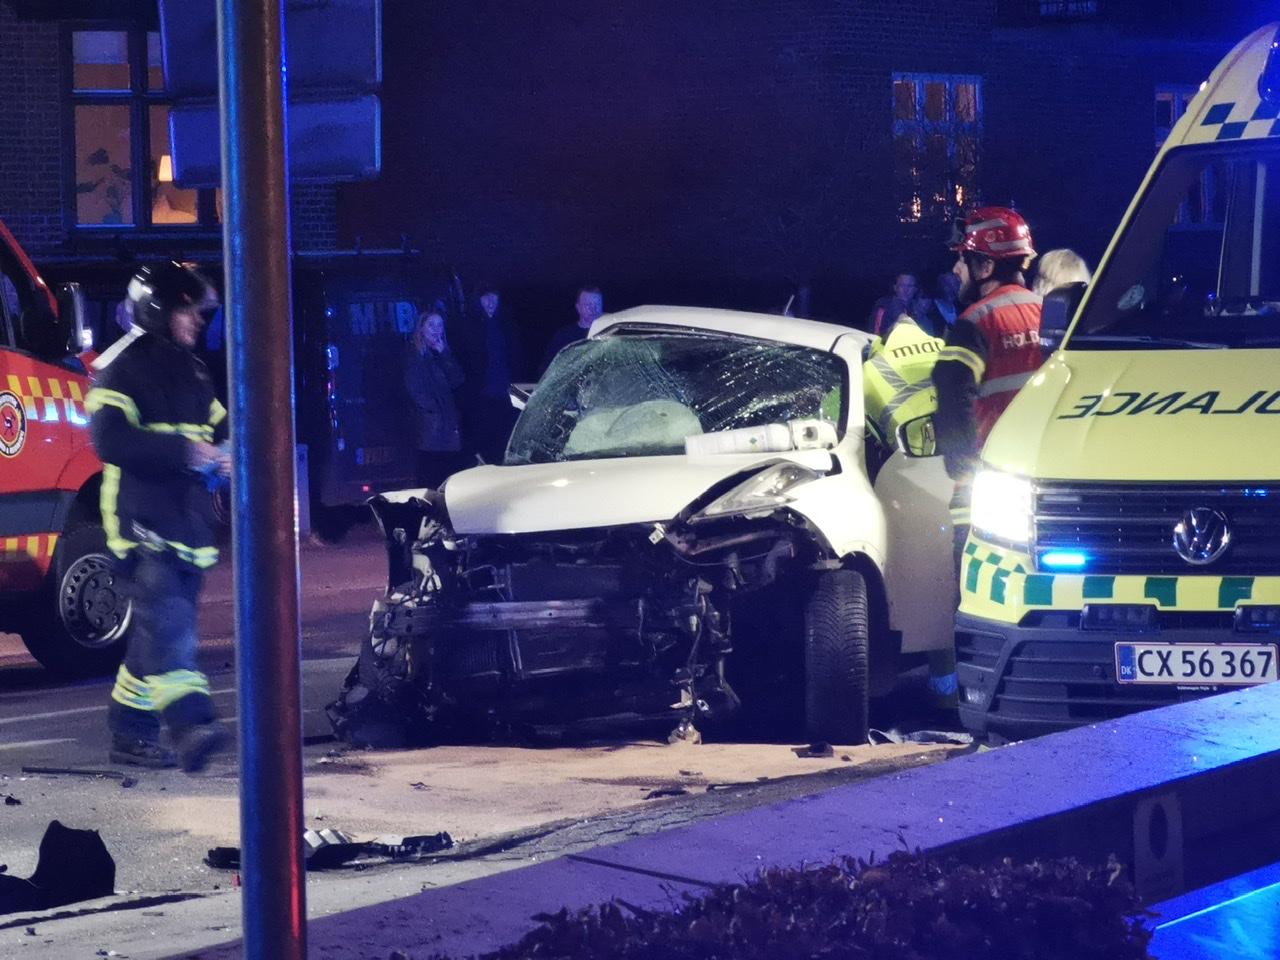 Alvorlig ulykke i Silkeborg